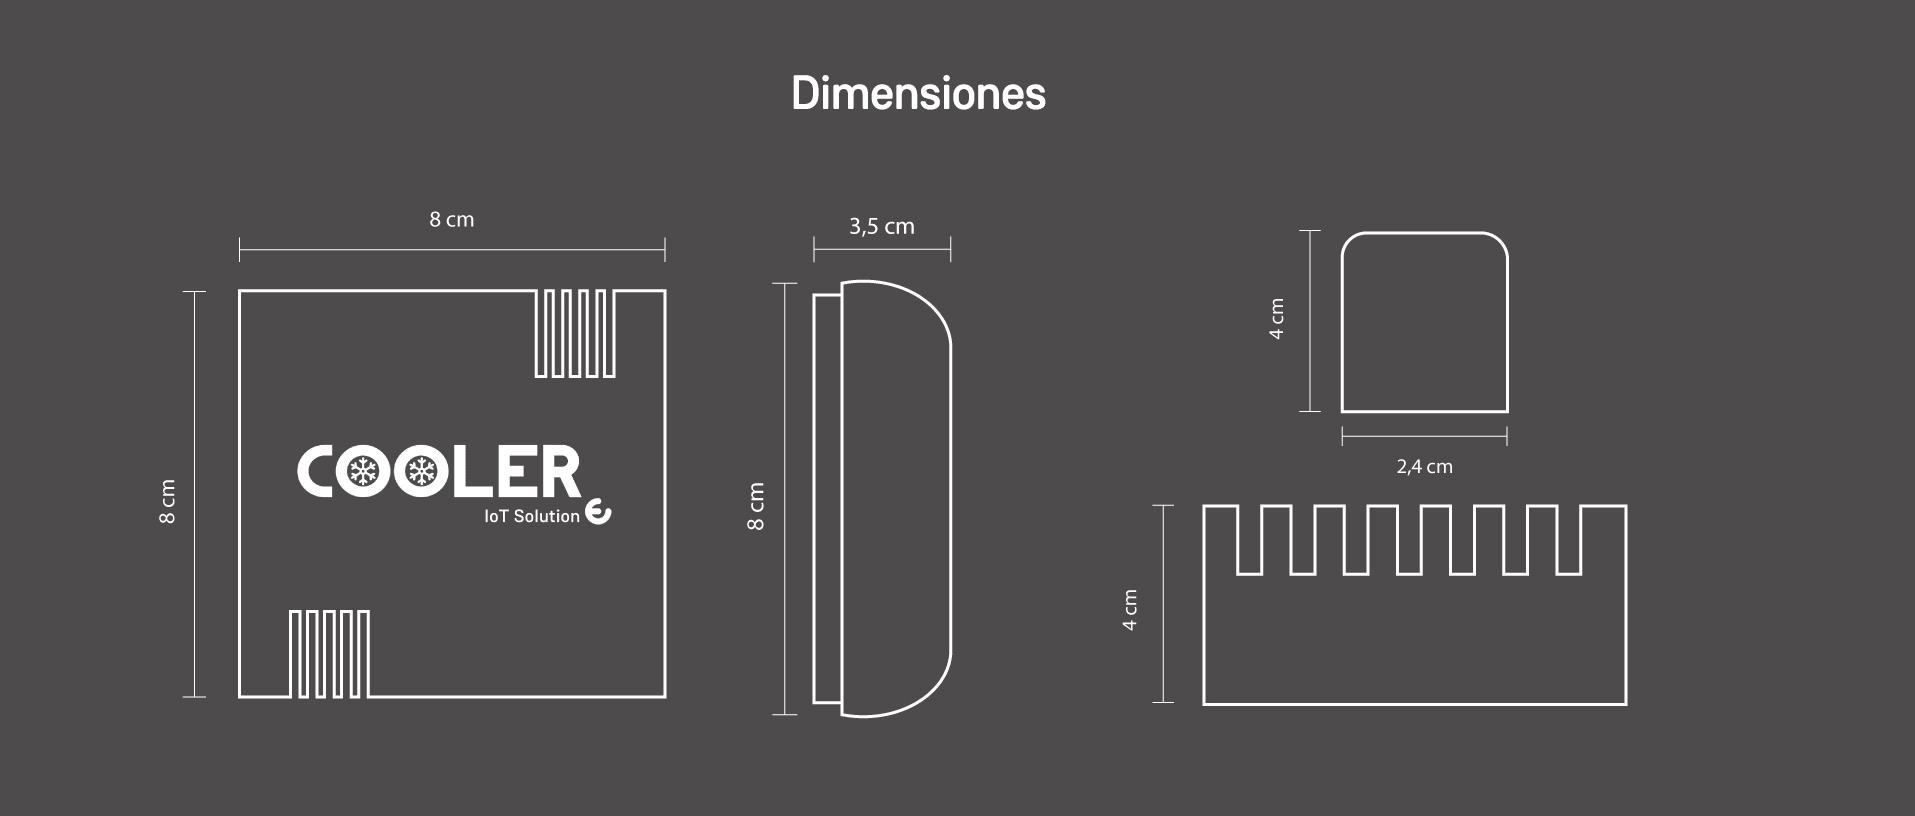 Cooler dimensiones dispositivos